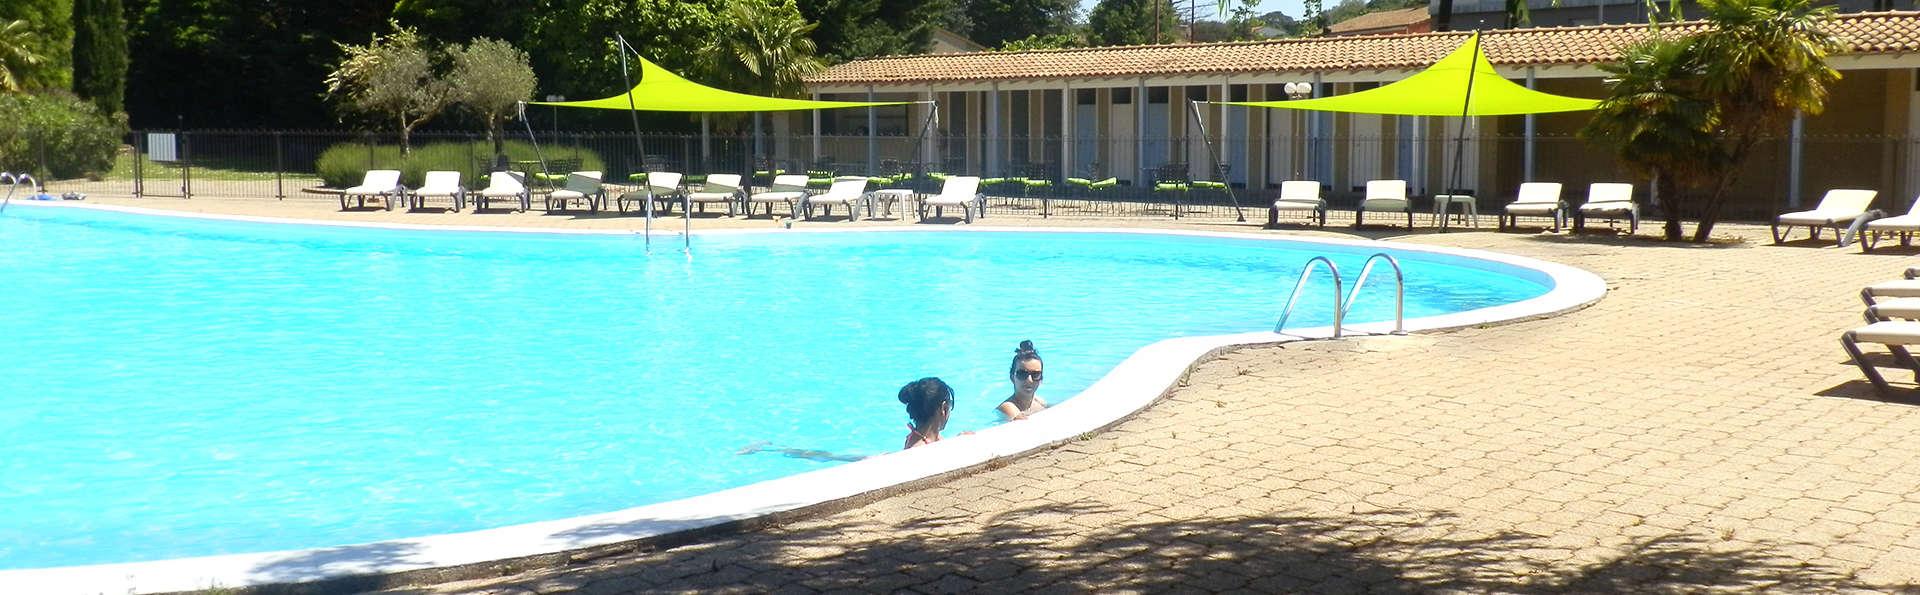 Hôtel Les Oliviers - EDIT_Pool.jpg